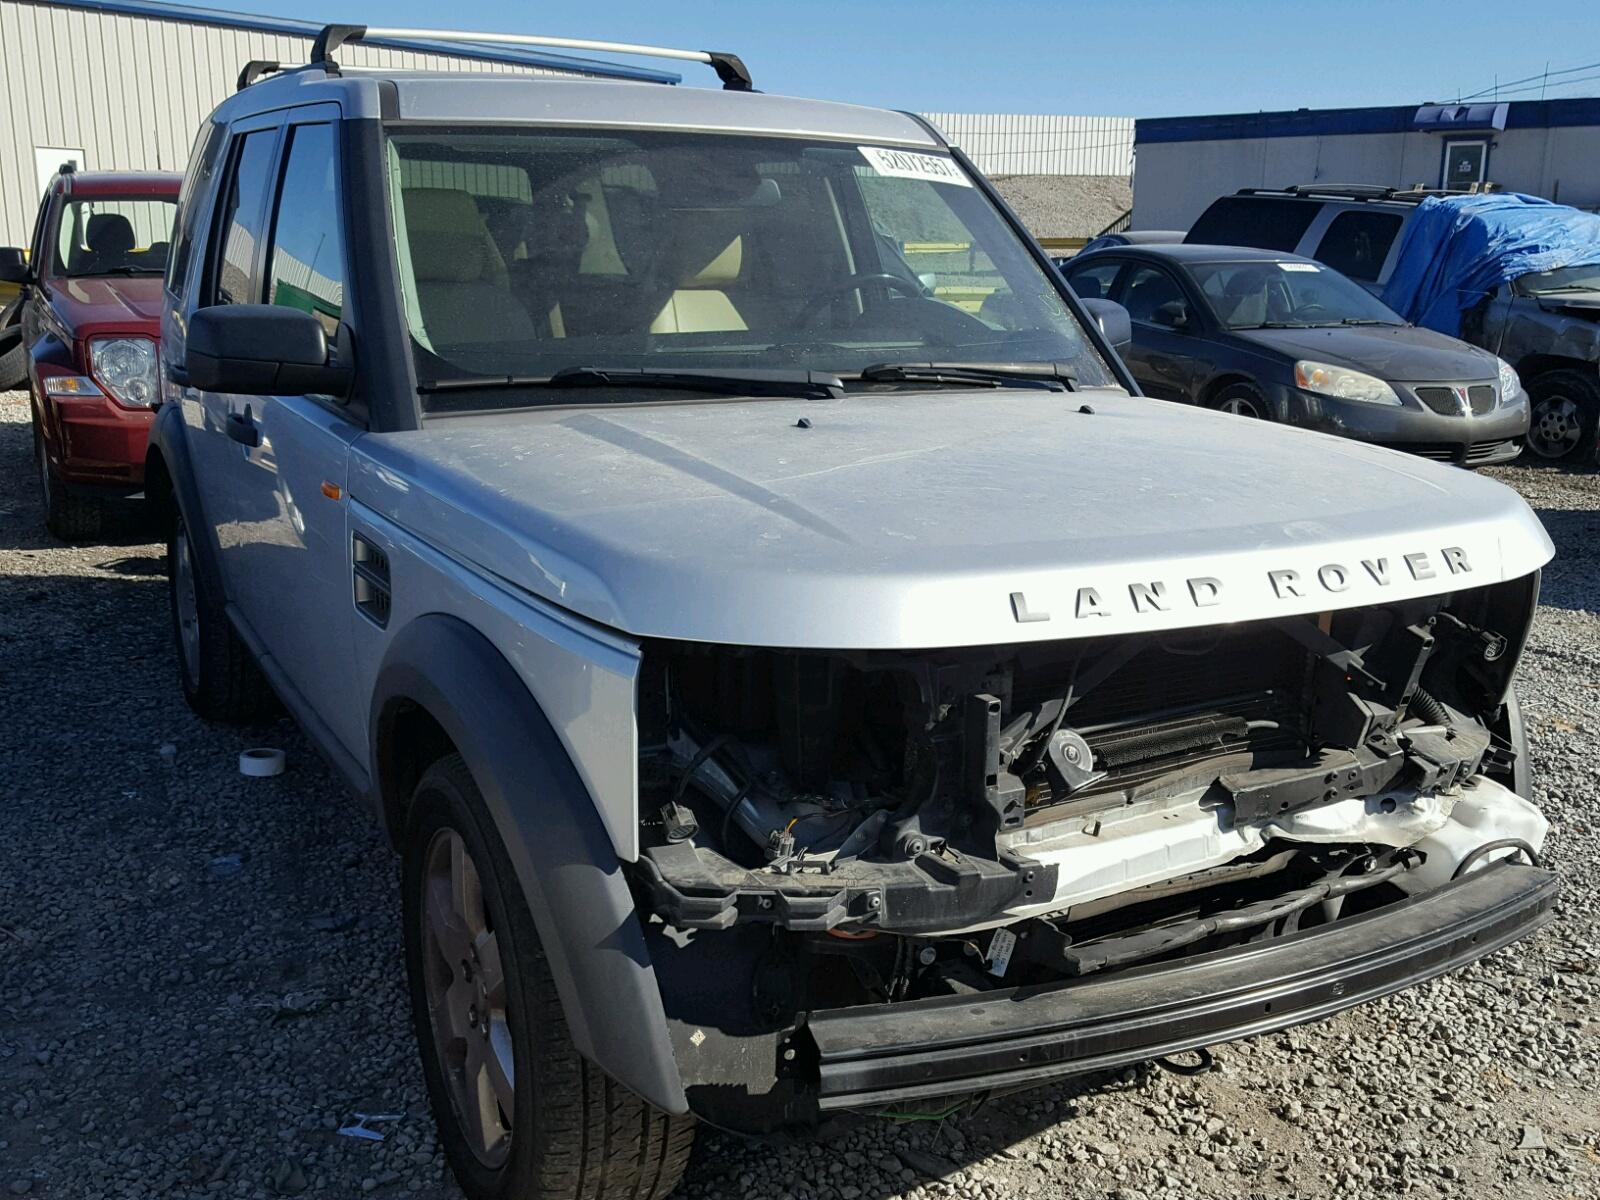 on land lot carfinder se auction auto vin receipt ca hse rover junk for auctions landrover sale hayward en ended copart online